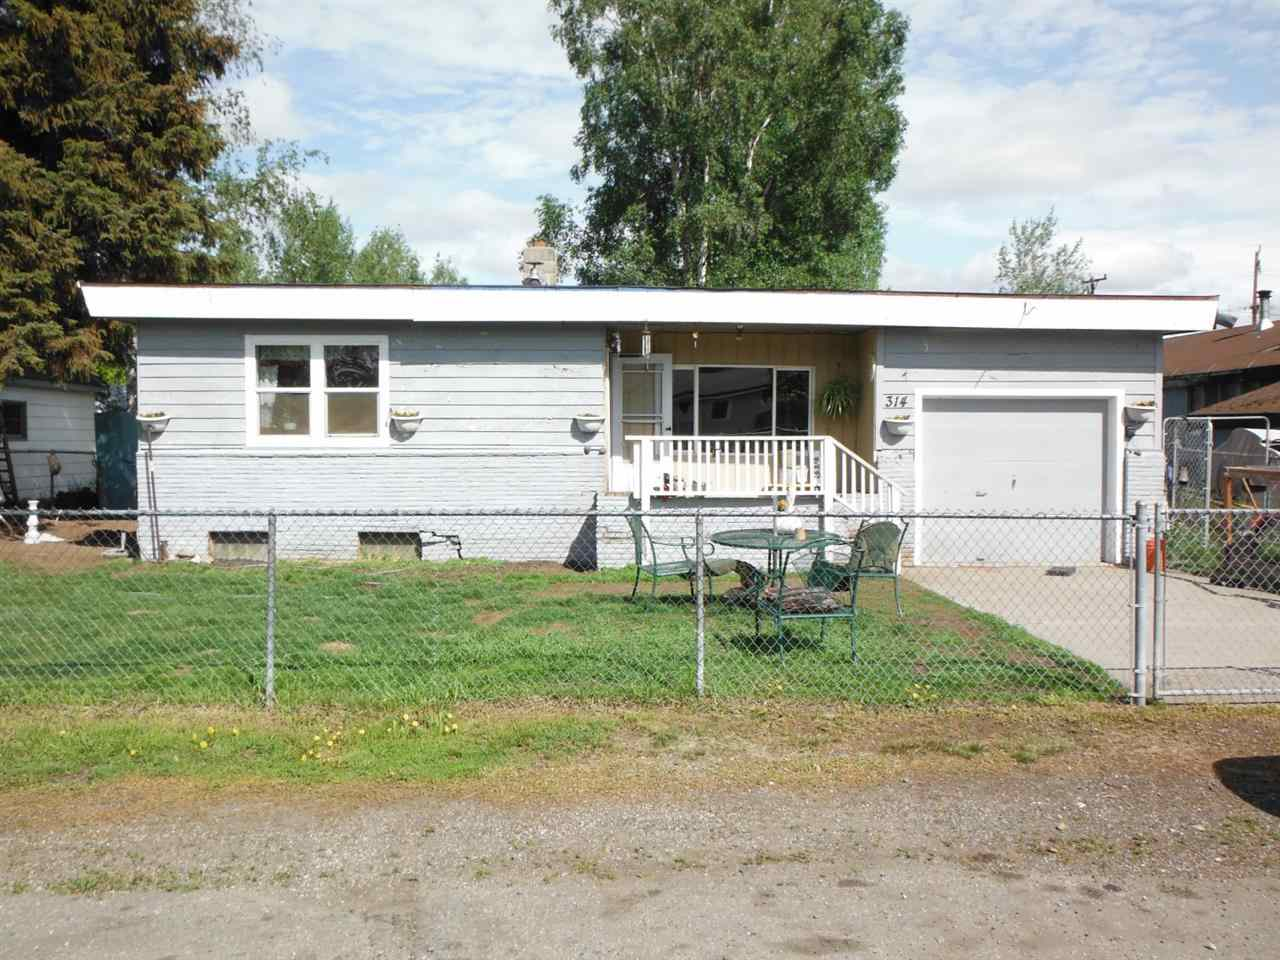 314 Dunbar Ave, Fairbanks, AK 99701